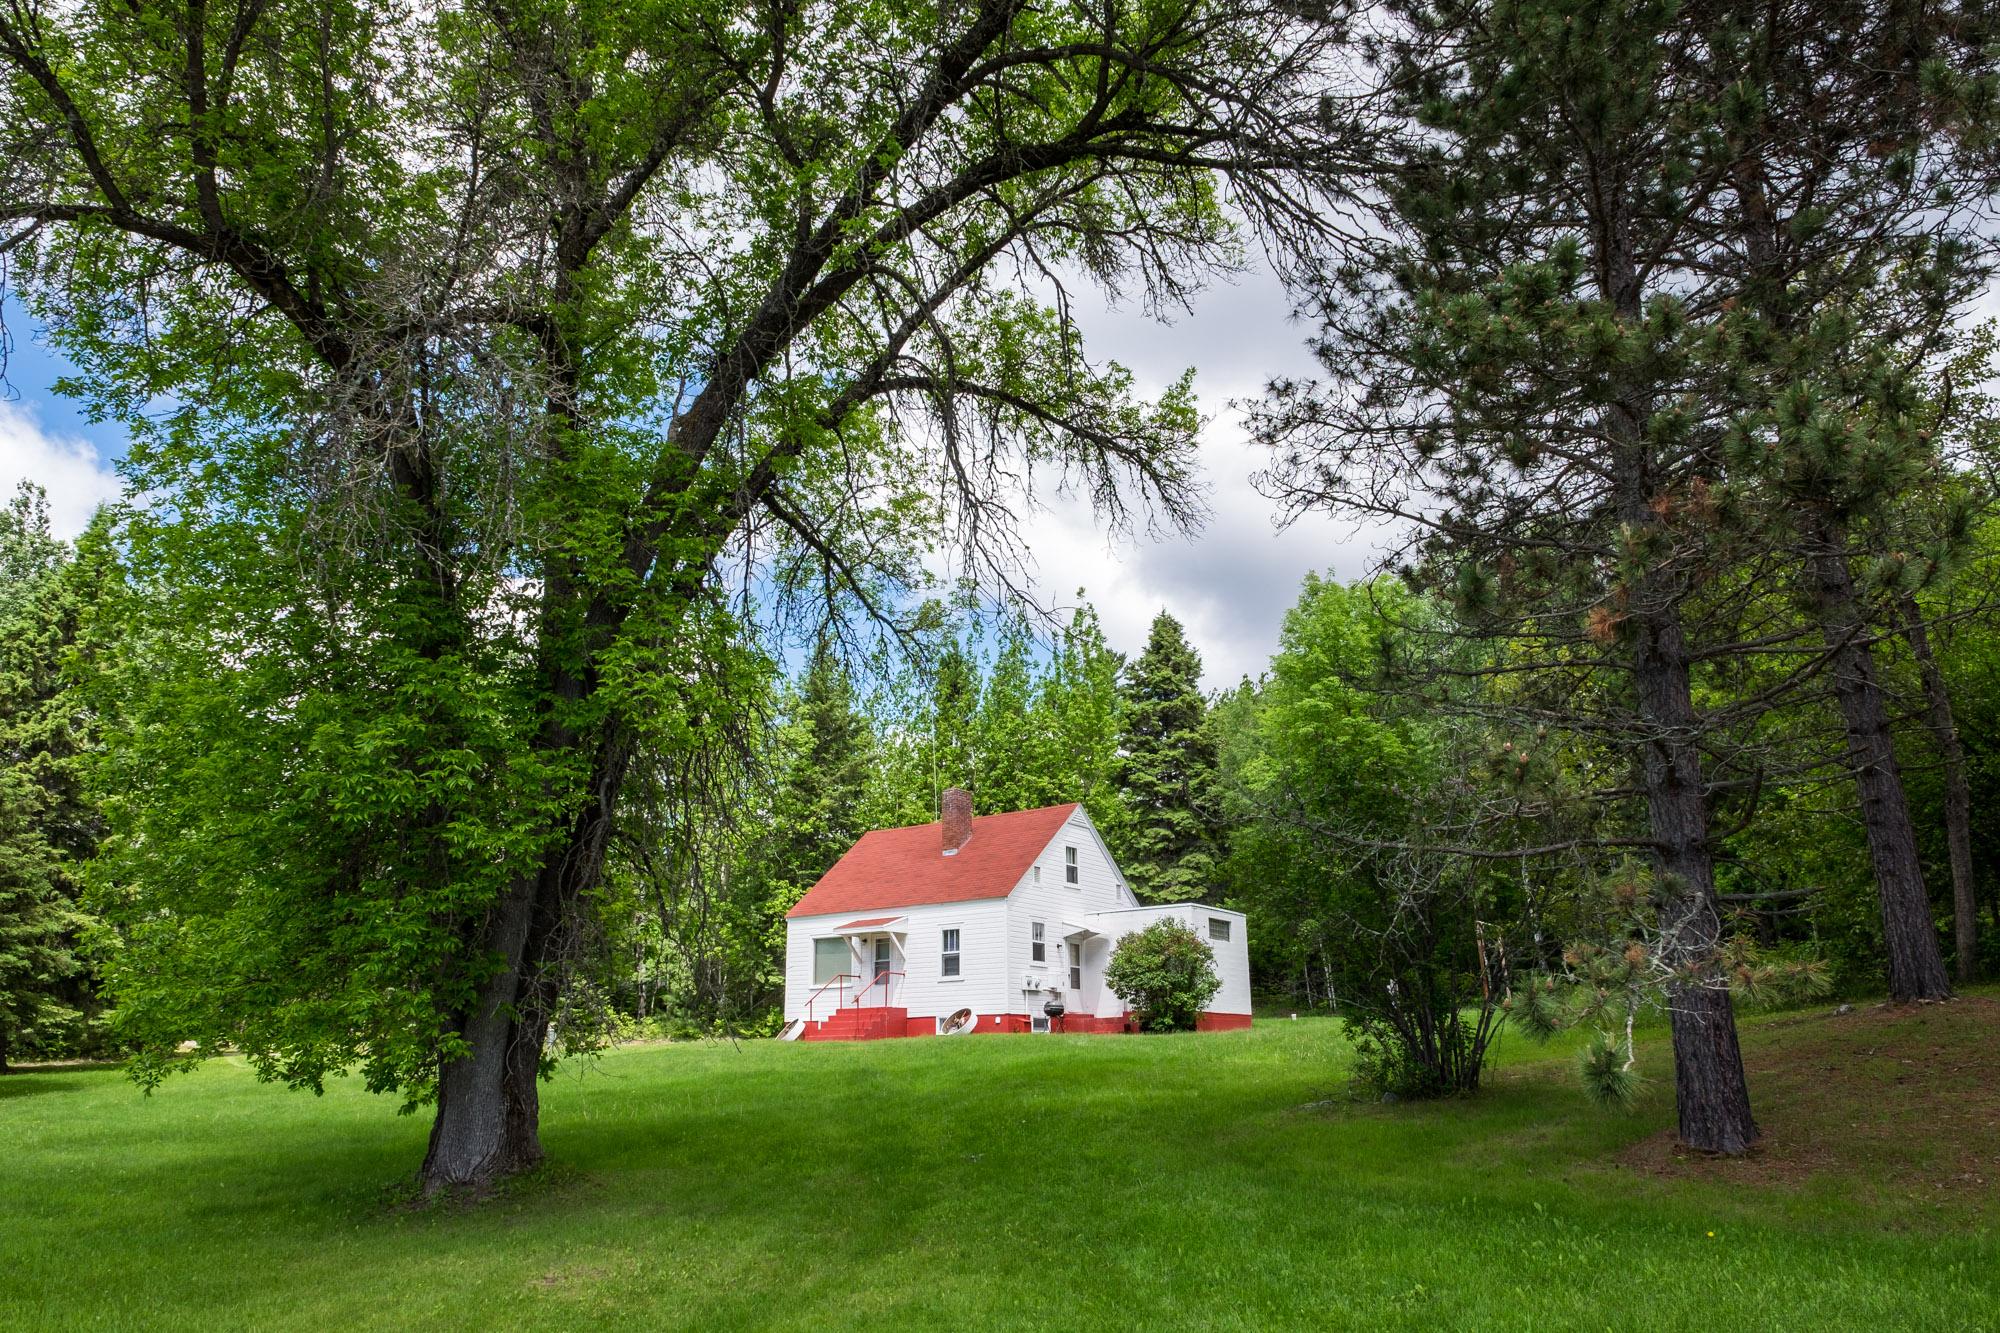 Pretty country home.